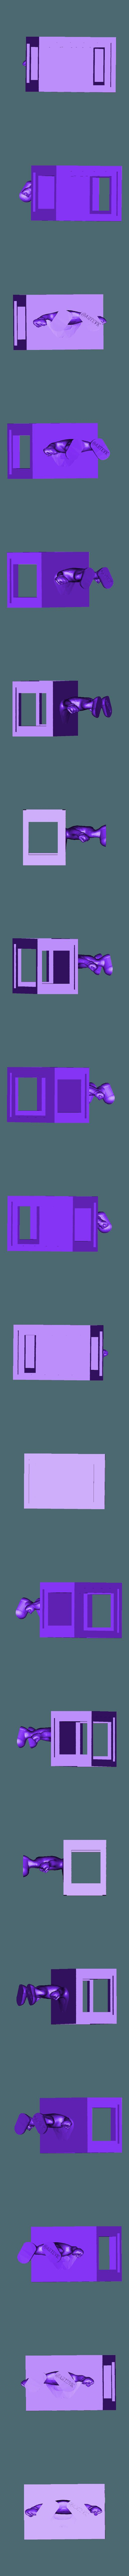 WATERTANK_2.stl Download free STL file FISH TANK FUNKO POP OR PEGGYBANK • 3D printer template, gaaraa